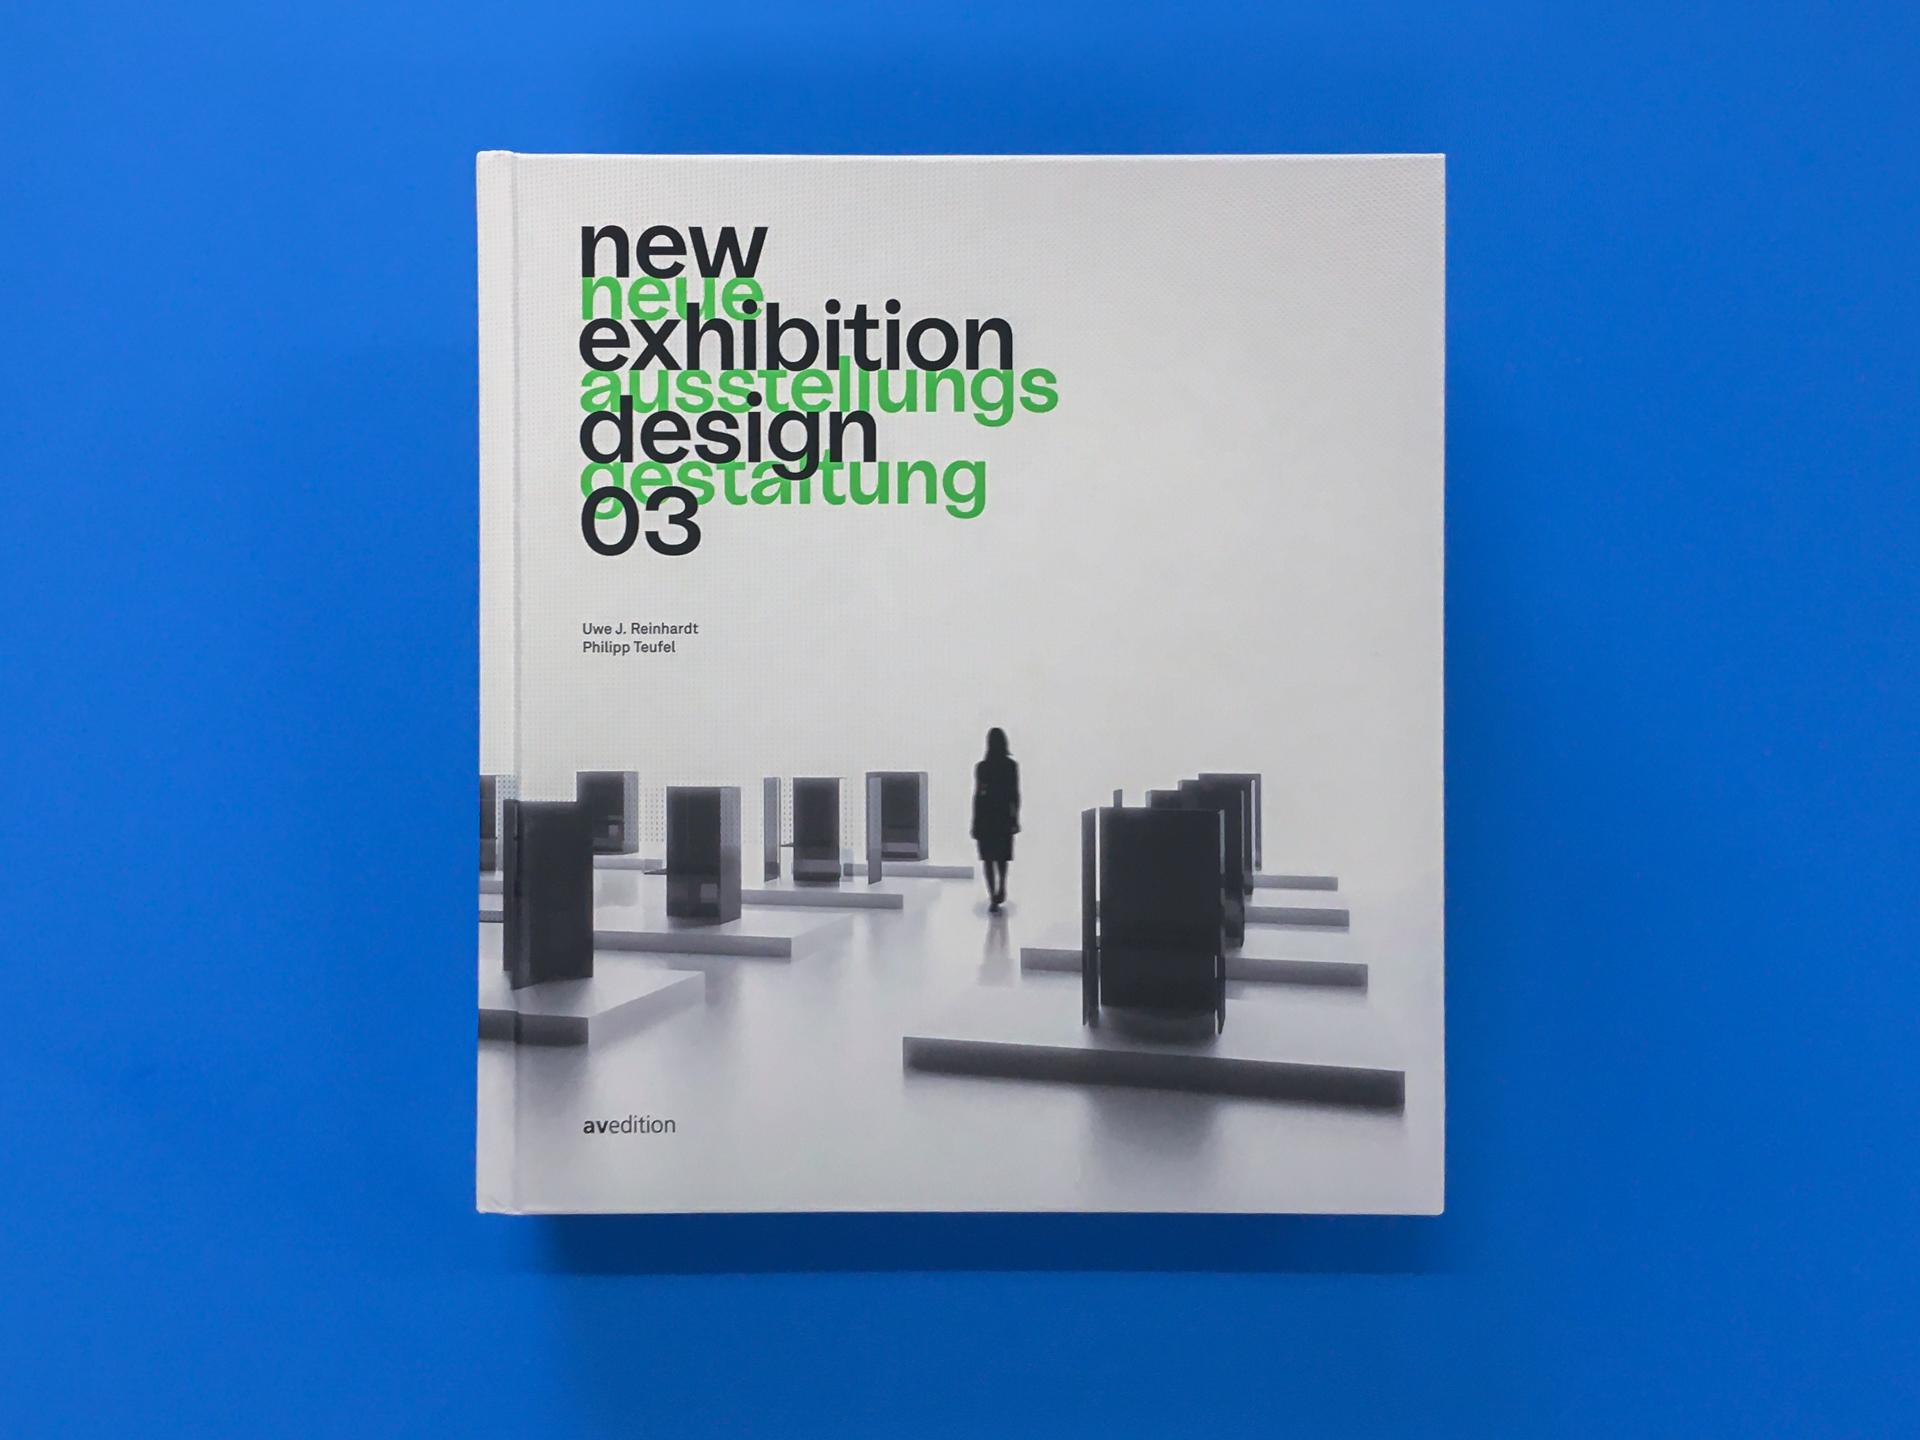 dvvd na tm new exhibition design 03 book 1 home 1 jpg